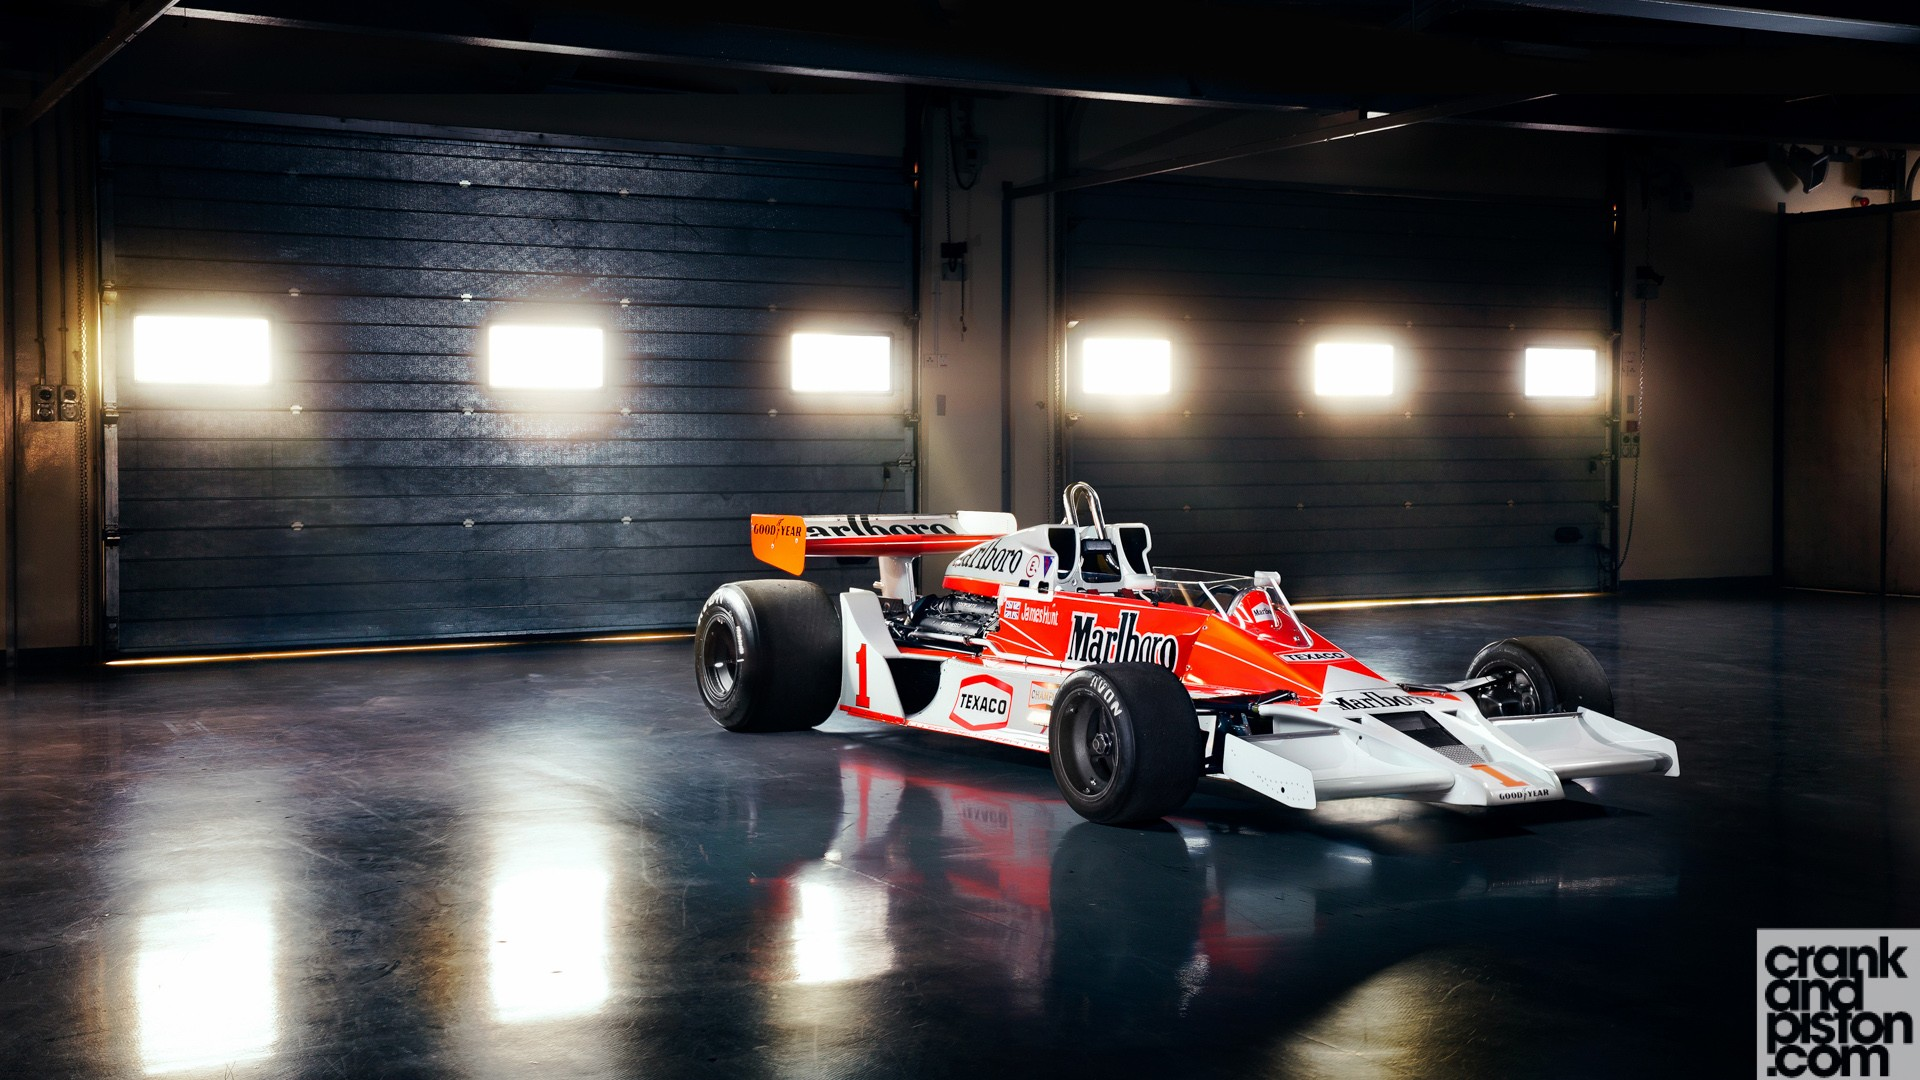 Tesla Car Iphone Wallpaper Mclaren M26 James Hunt Dubai Autodrome Wallpaper Hd Car